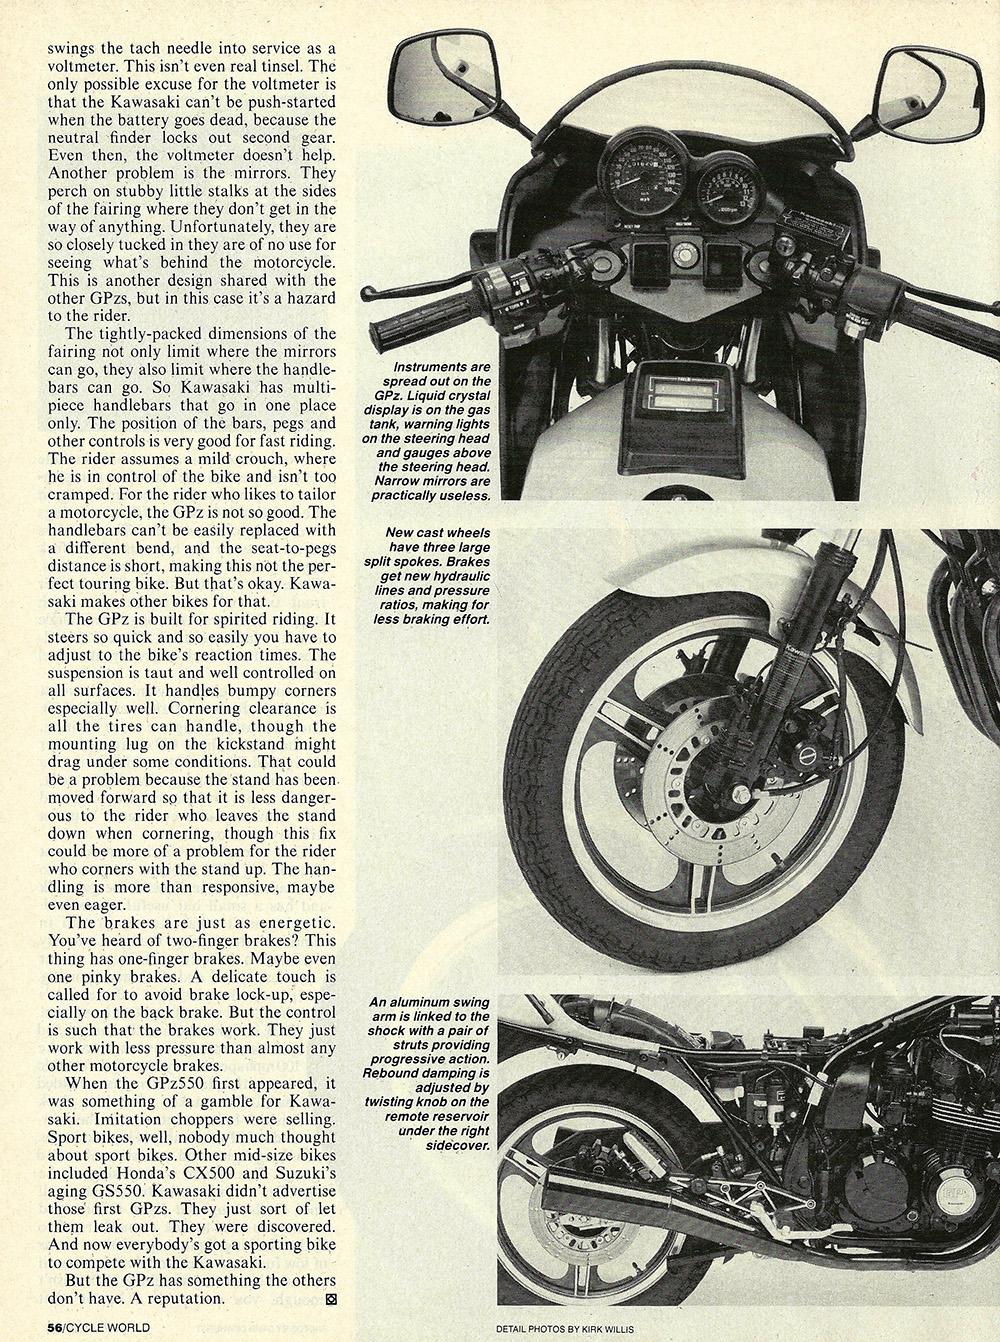 1984 Kawasaki GPz550 road test 05.jpg